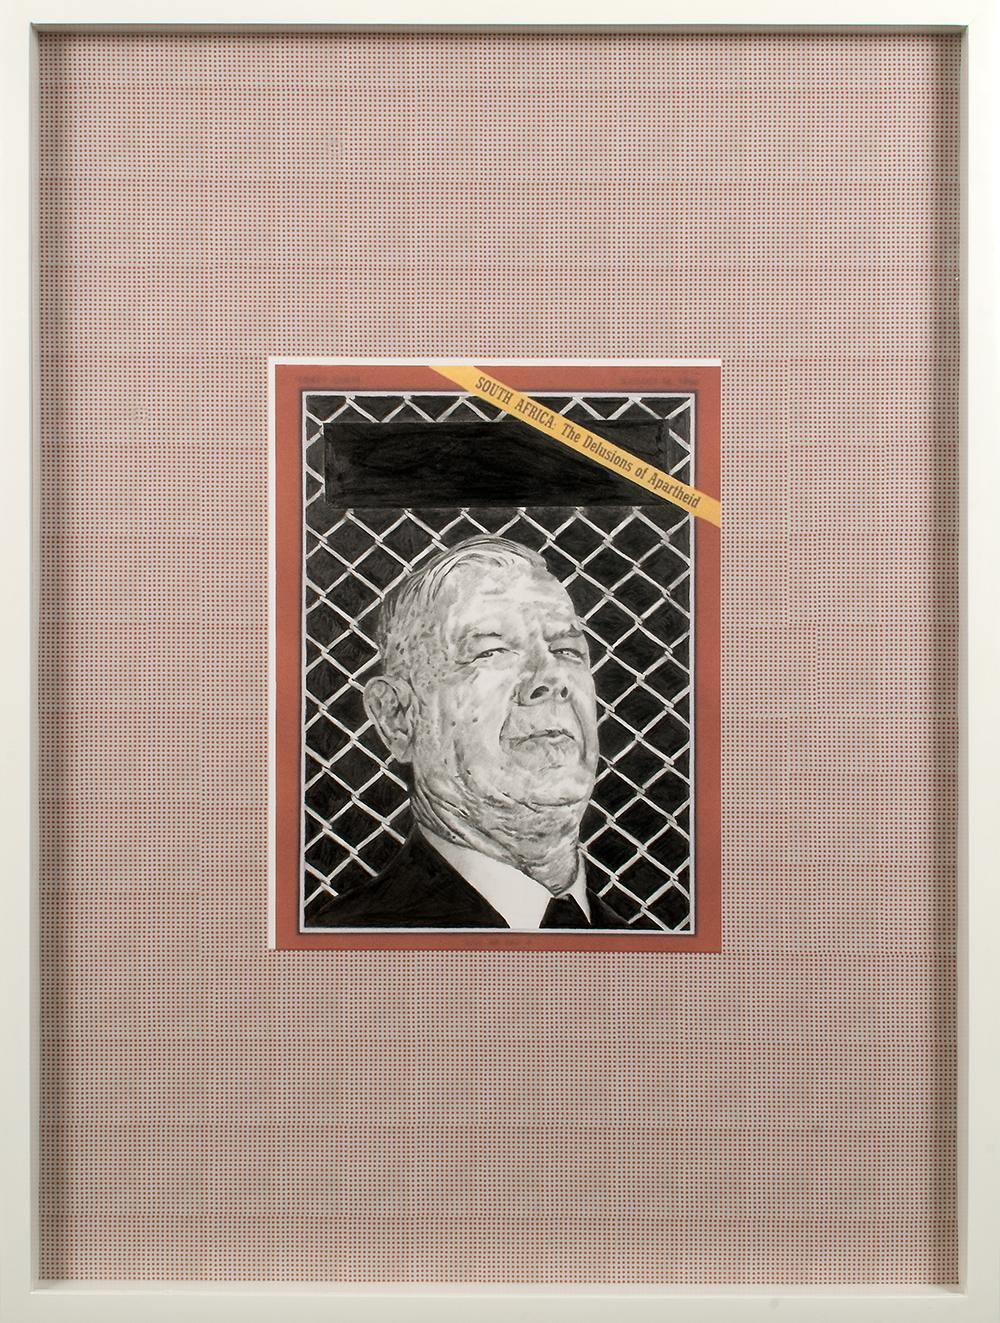 "no.30- Untitled (Hendrik Verwoerd) pencil on paper, ink jet print, 21""x28""/ 53cmx71cm,            2007/08"